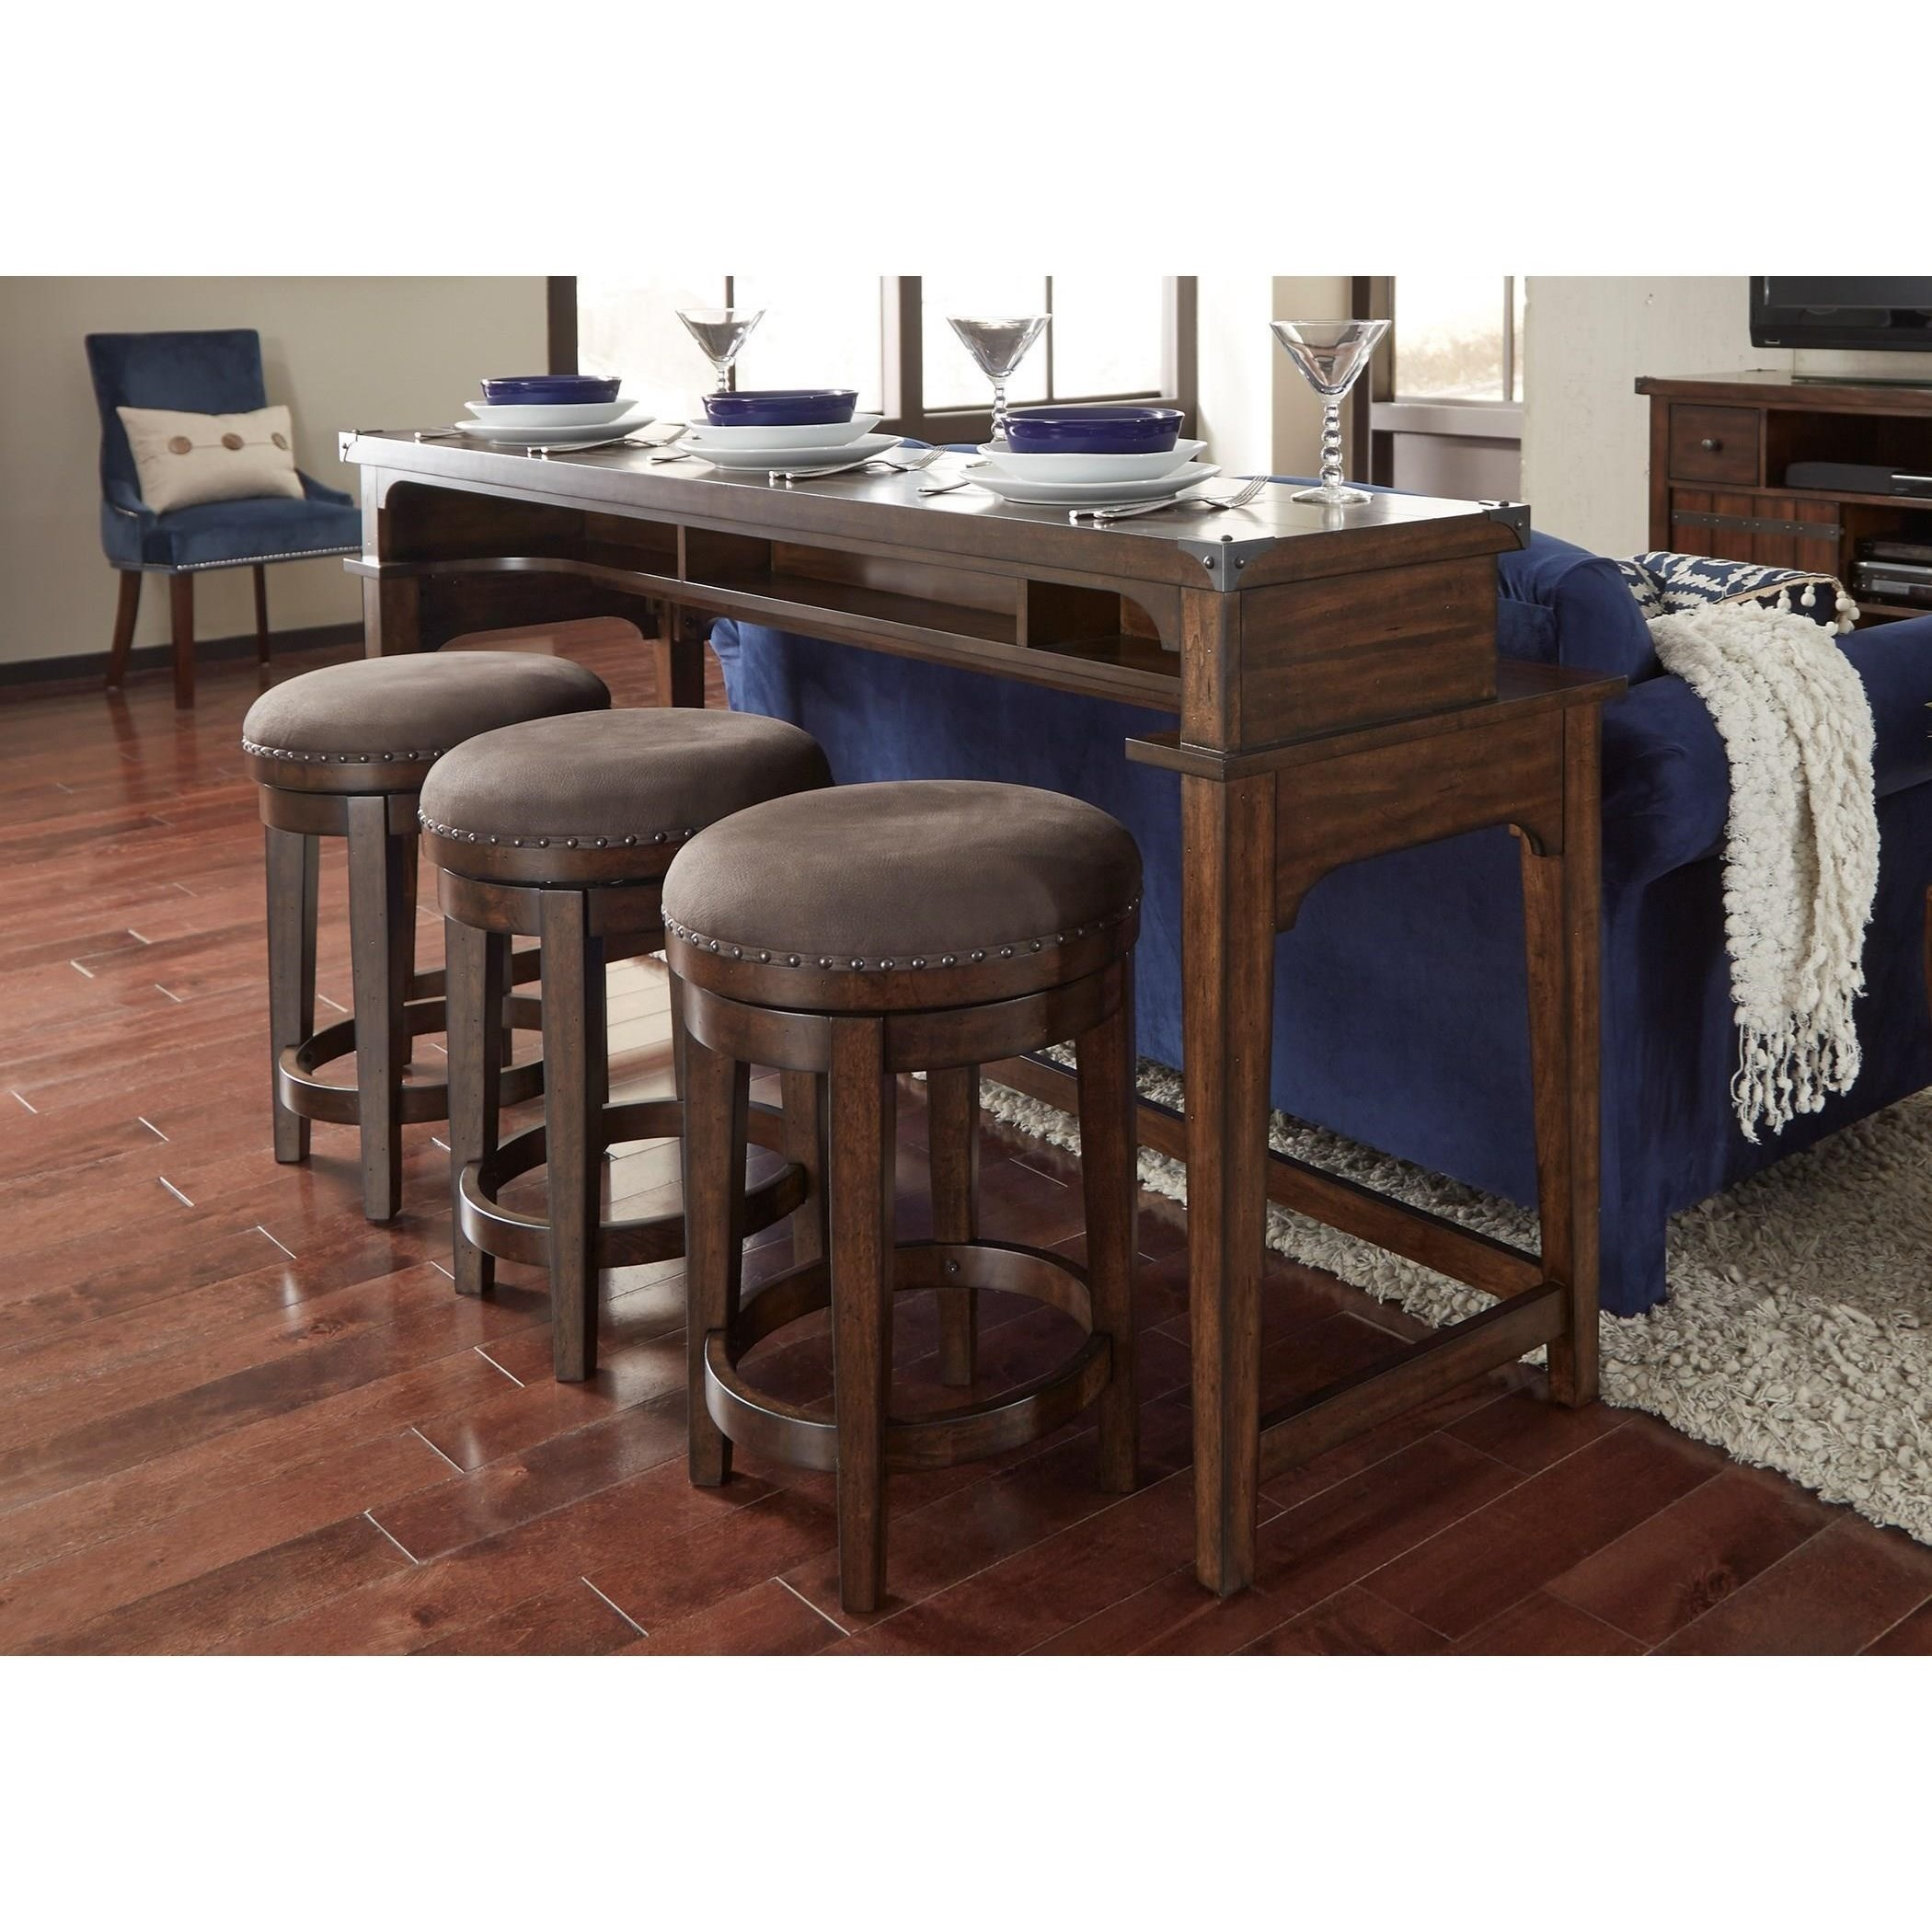 liberty furniture aspen skies counter height sofa table. Black Bedroom Furniture Sets. Home Design Ideas